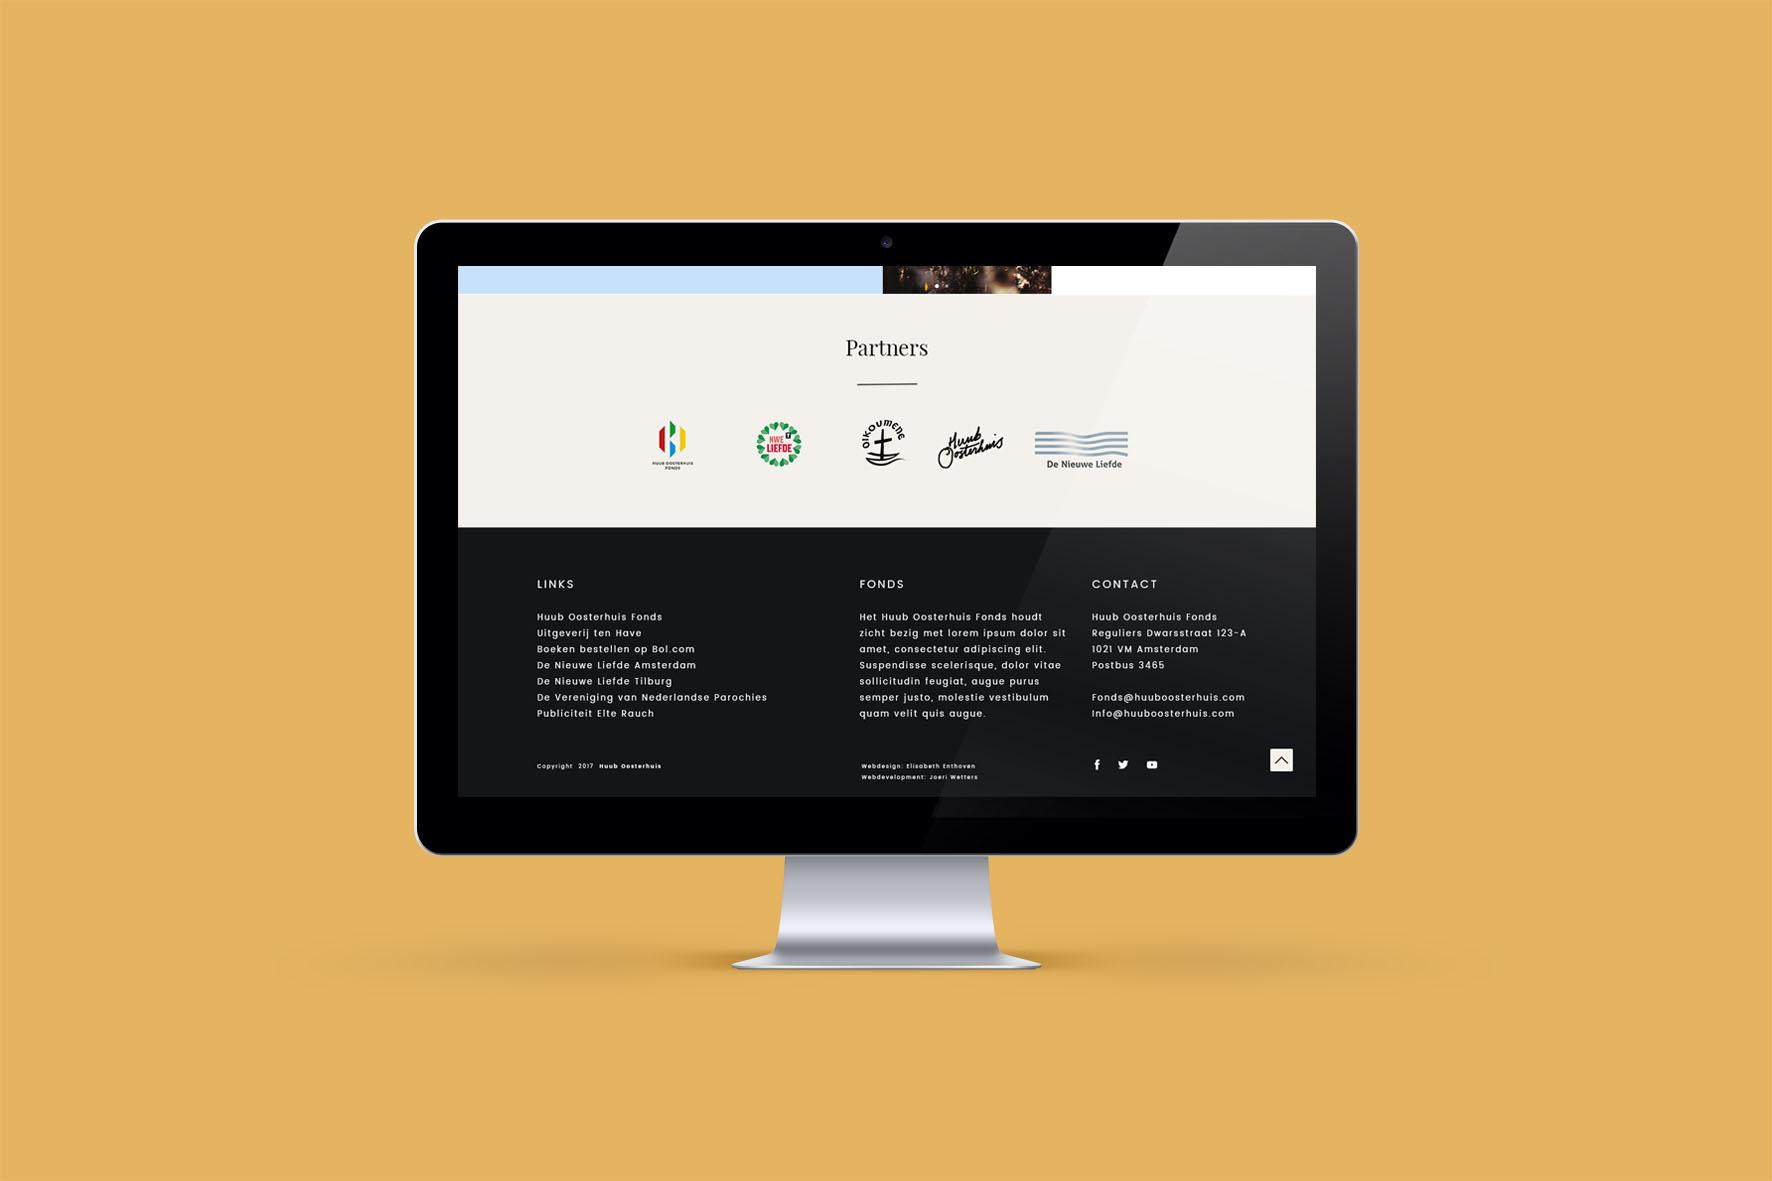 HUUB OOSTERHUIS WEBSITE